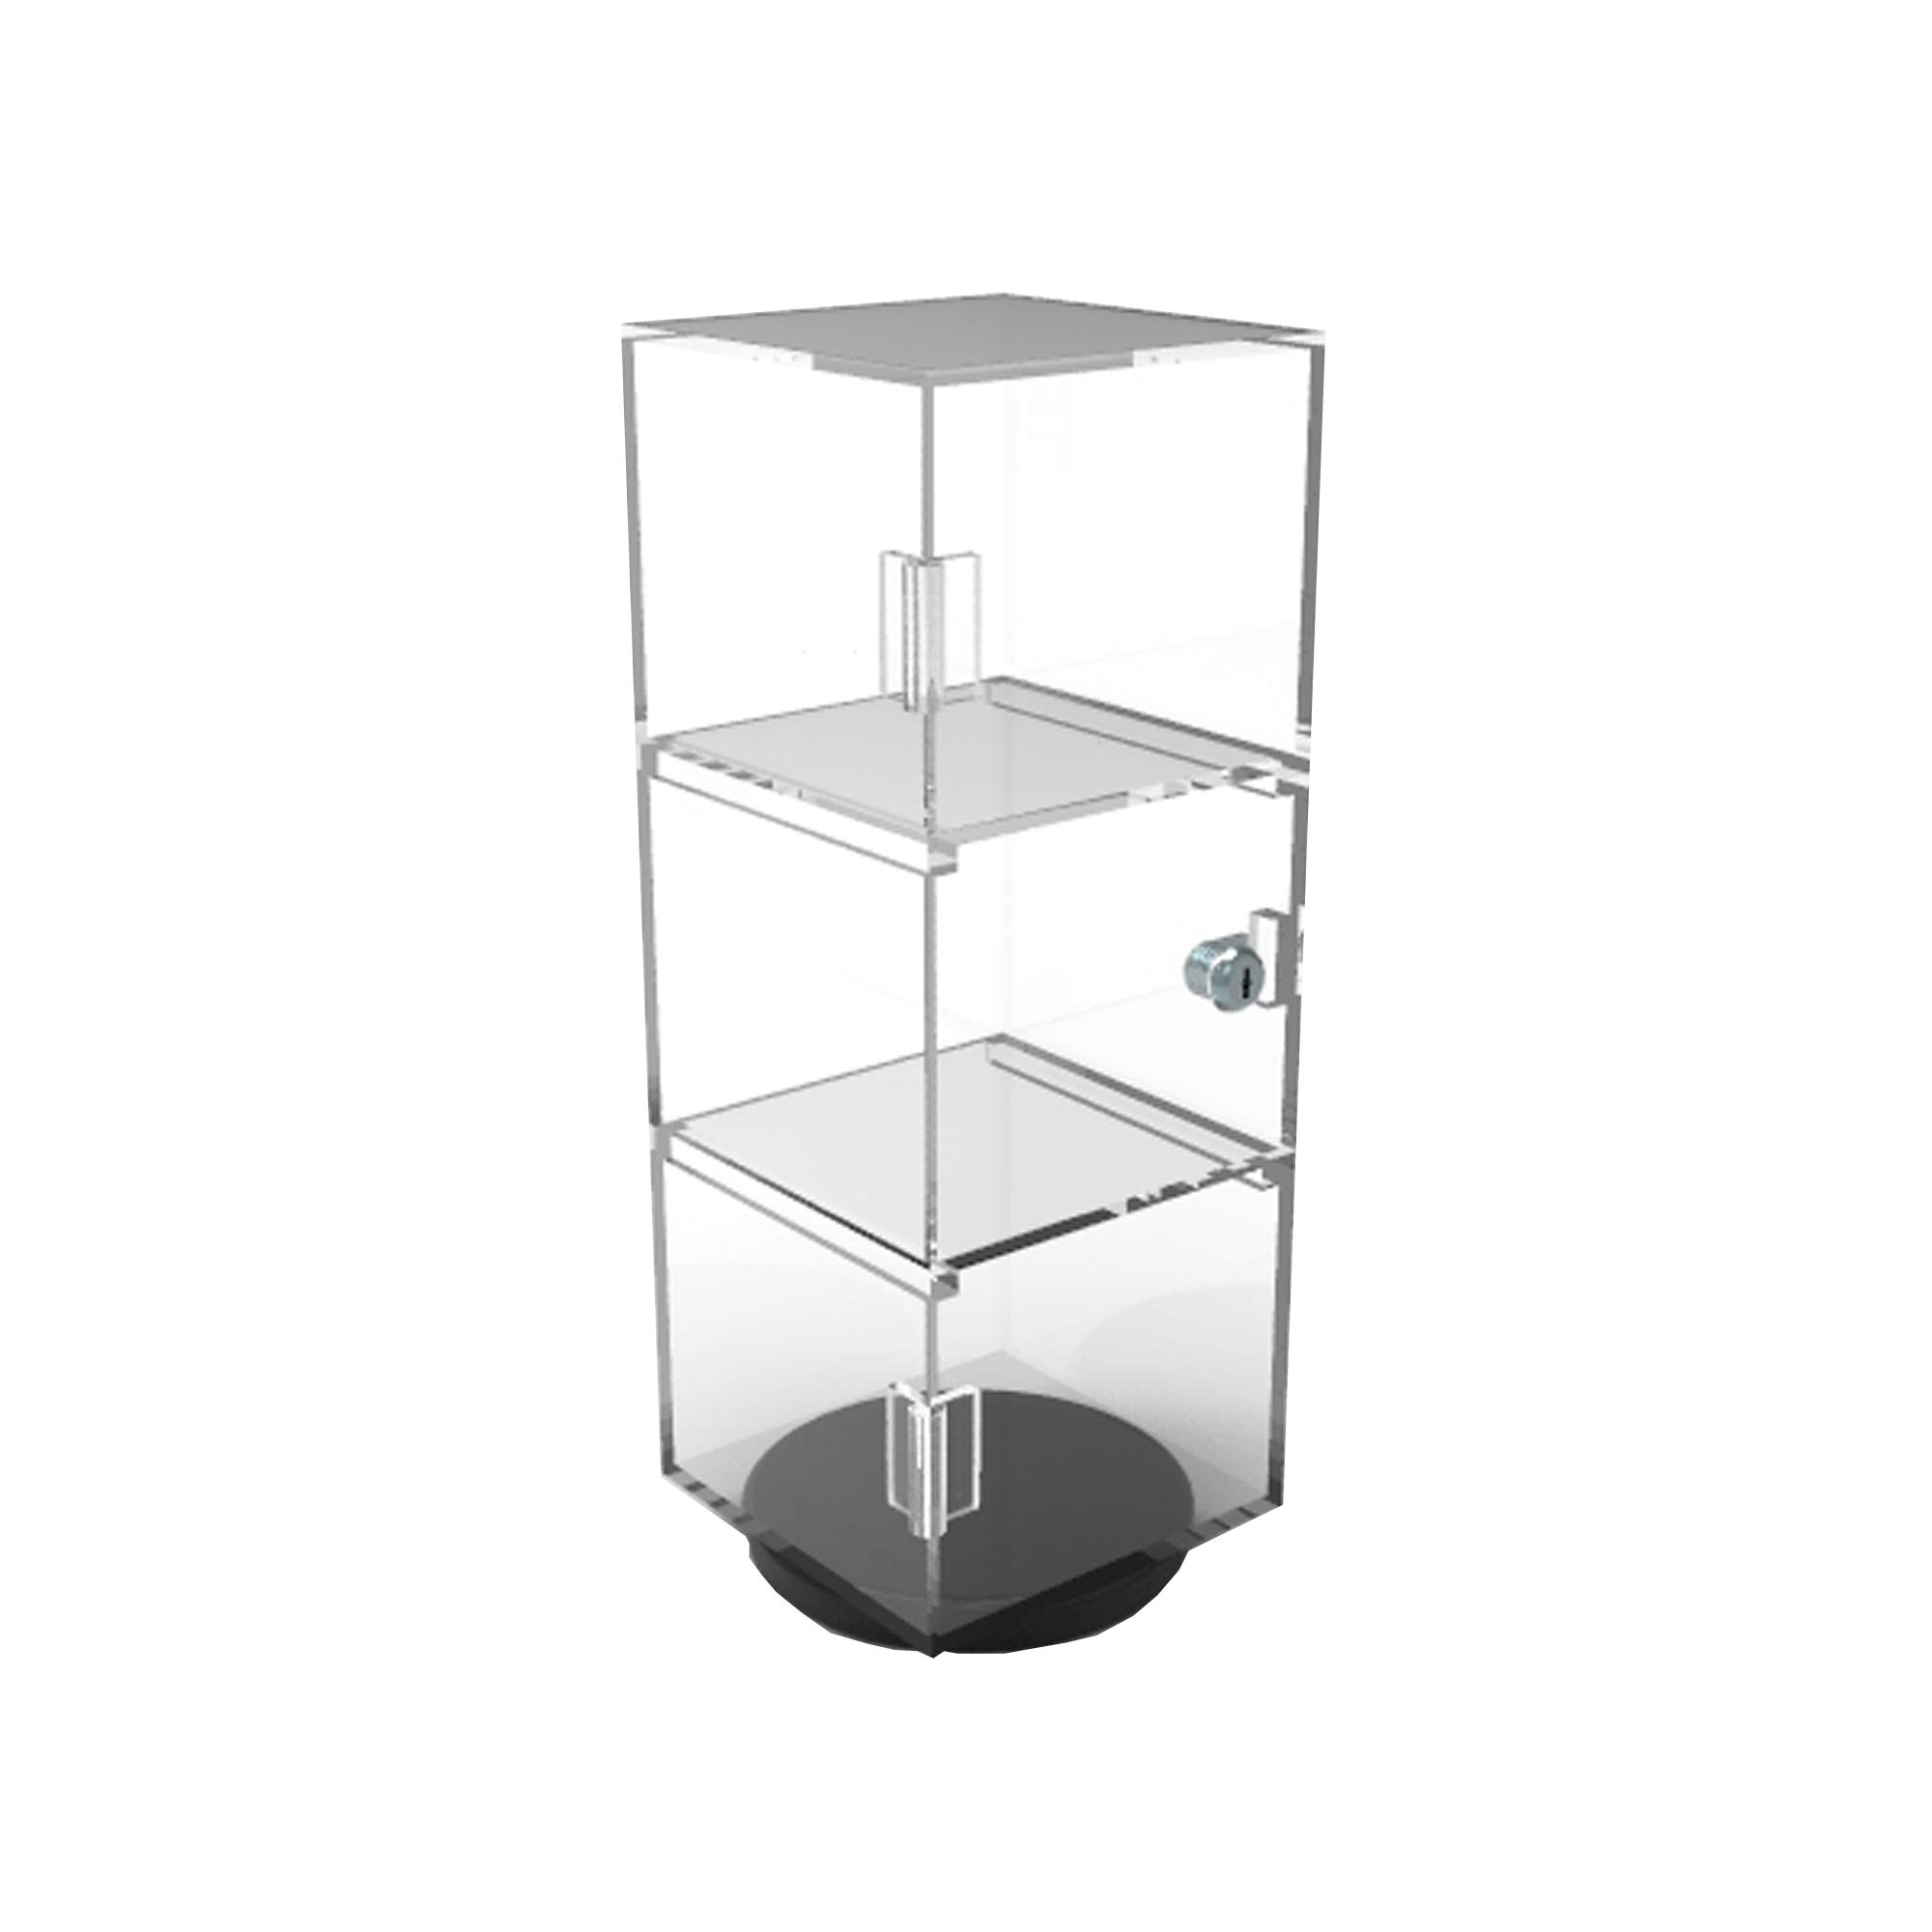 FixtureDisplays 6x6x16'' Rotating Mini Plexiglass Lucite Clear Acrylic Tower Showcase Display 20000